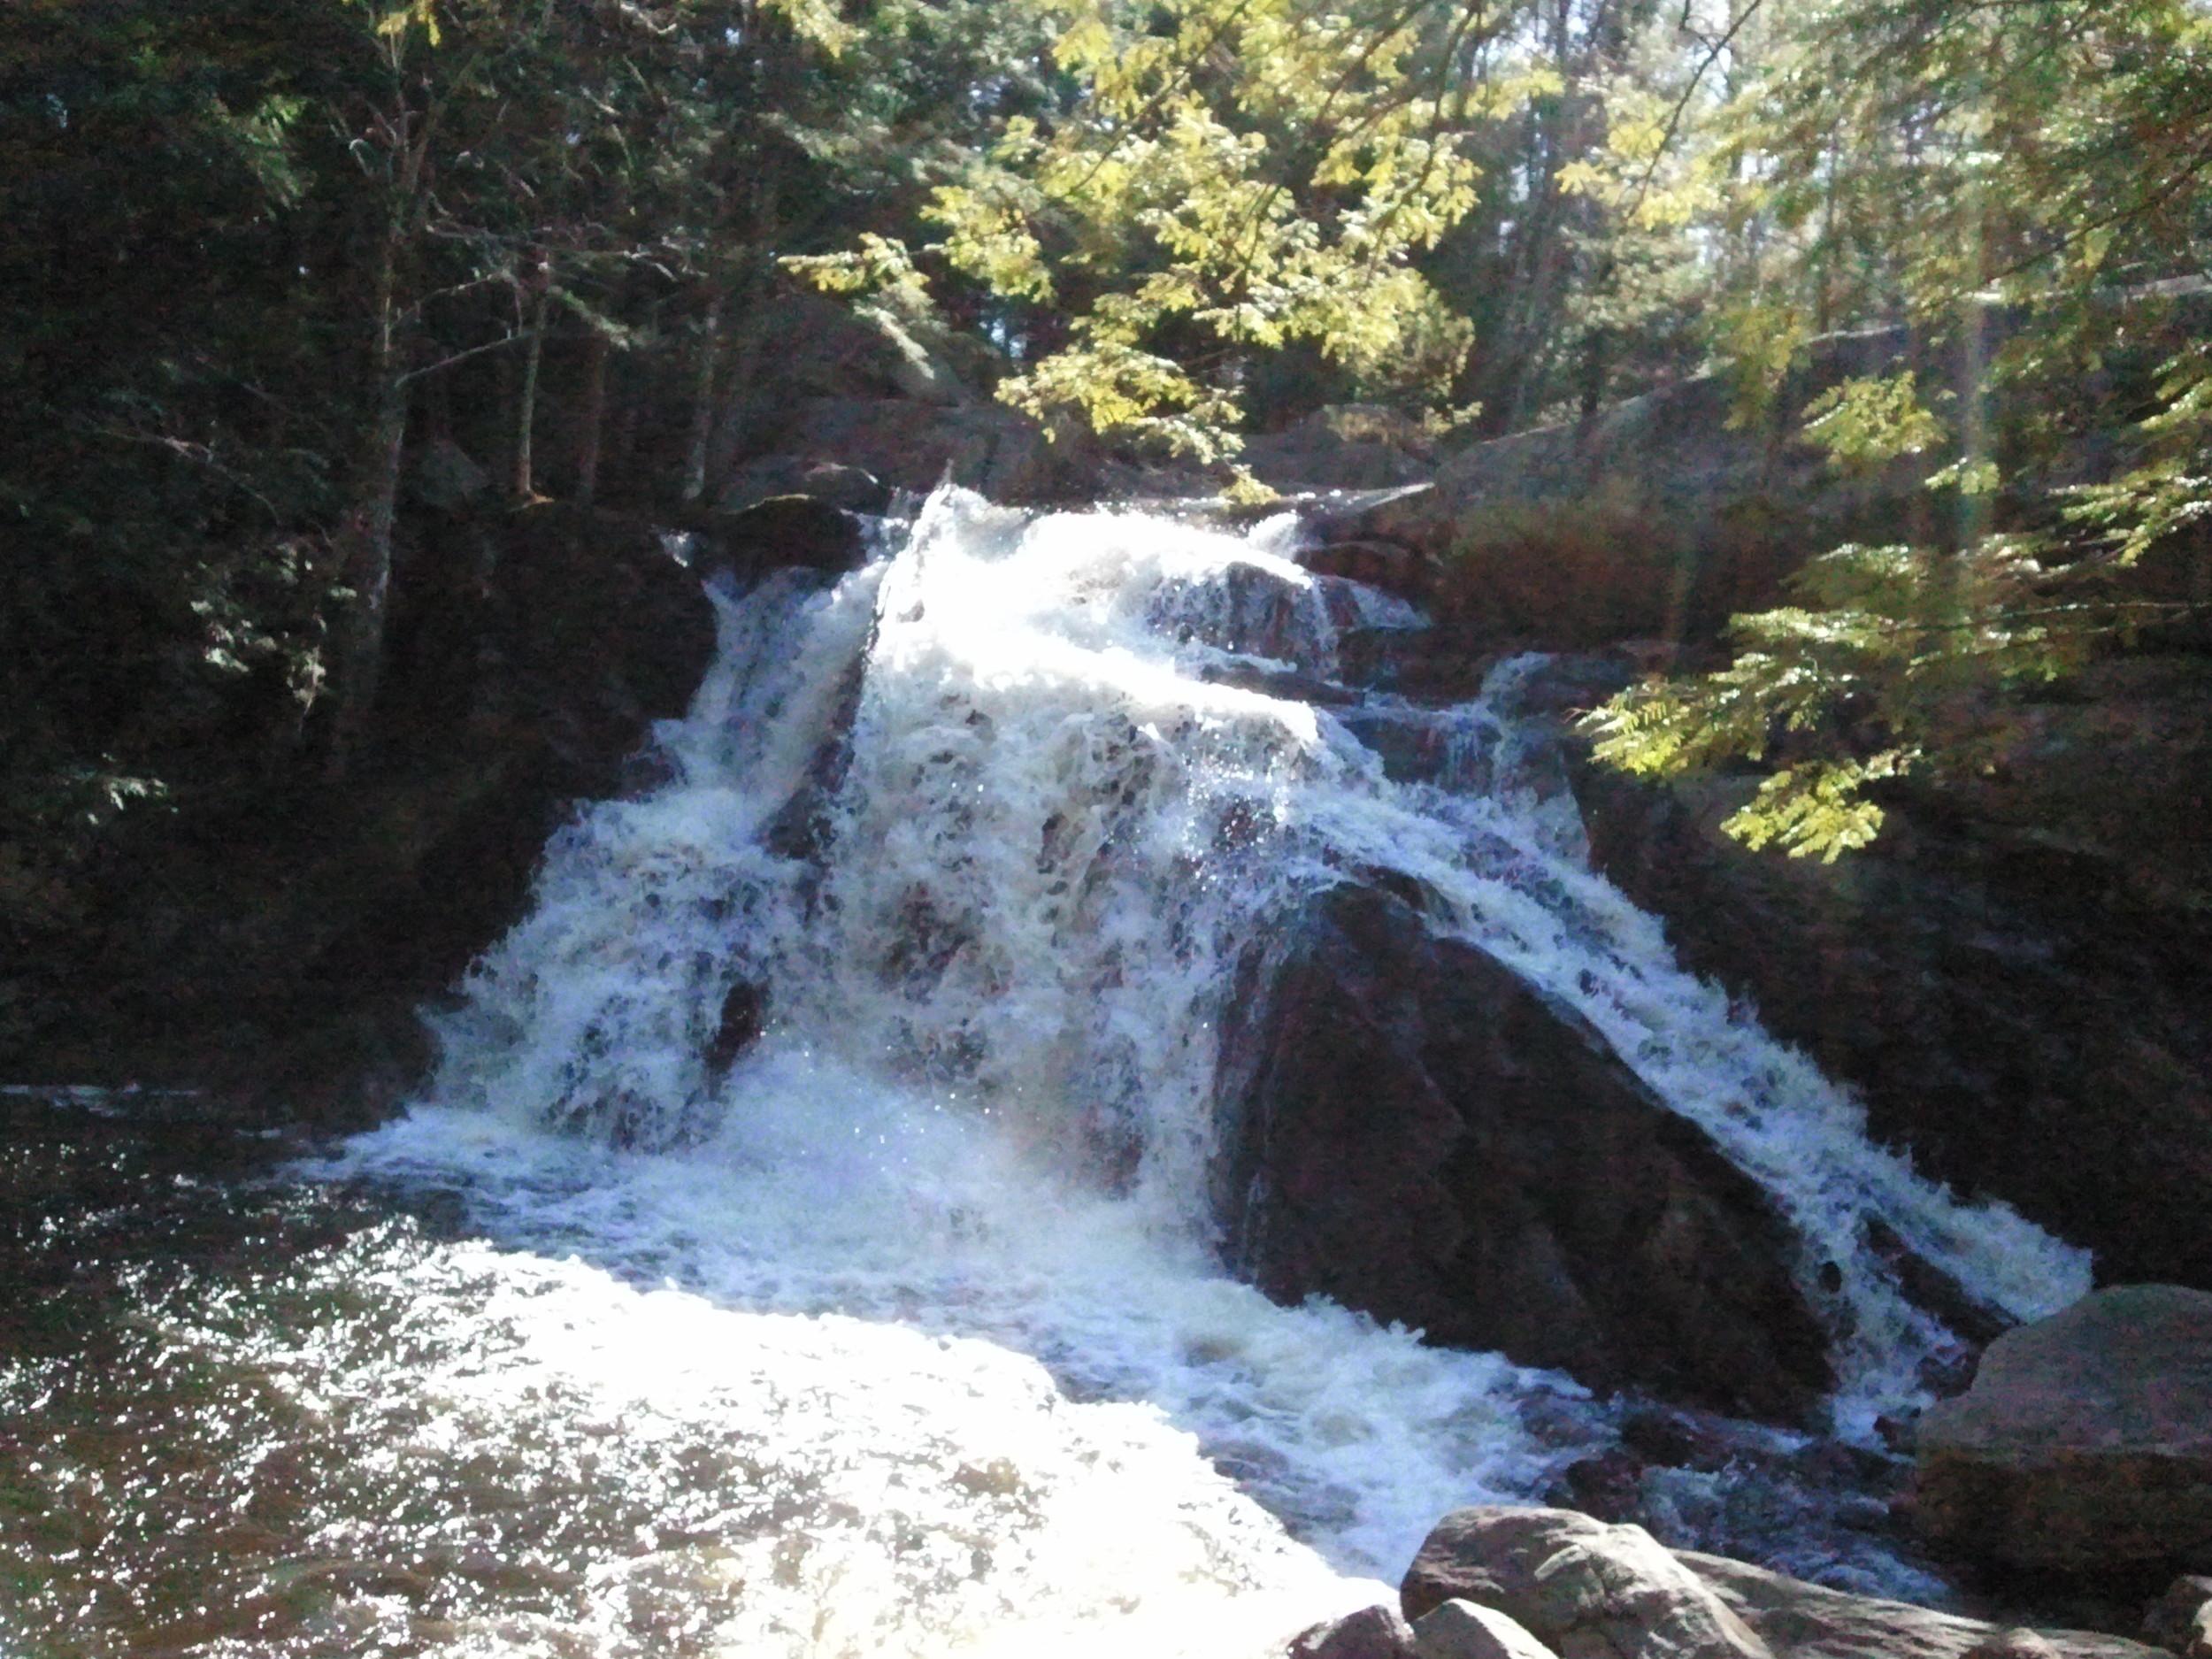 Lower Falls April 2016